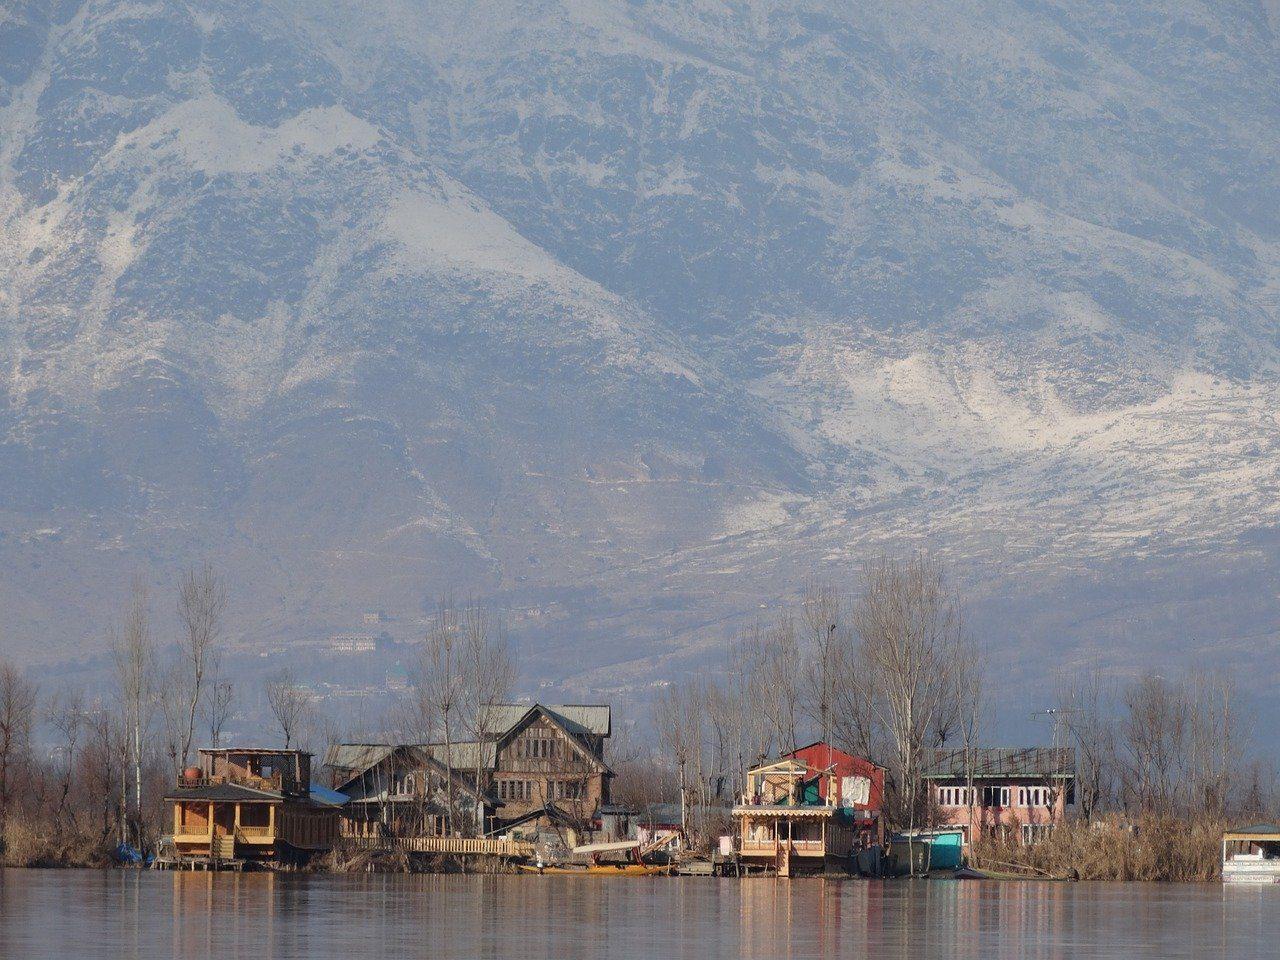 srinagar, mountain, snow-4099009.jpg